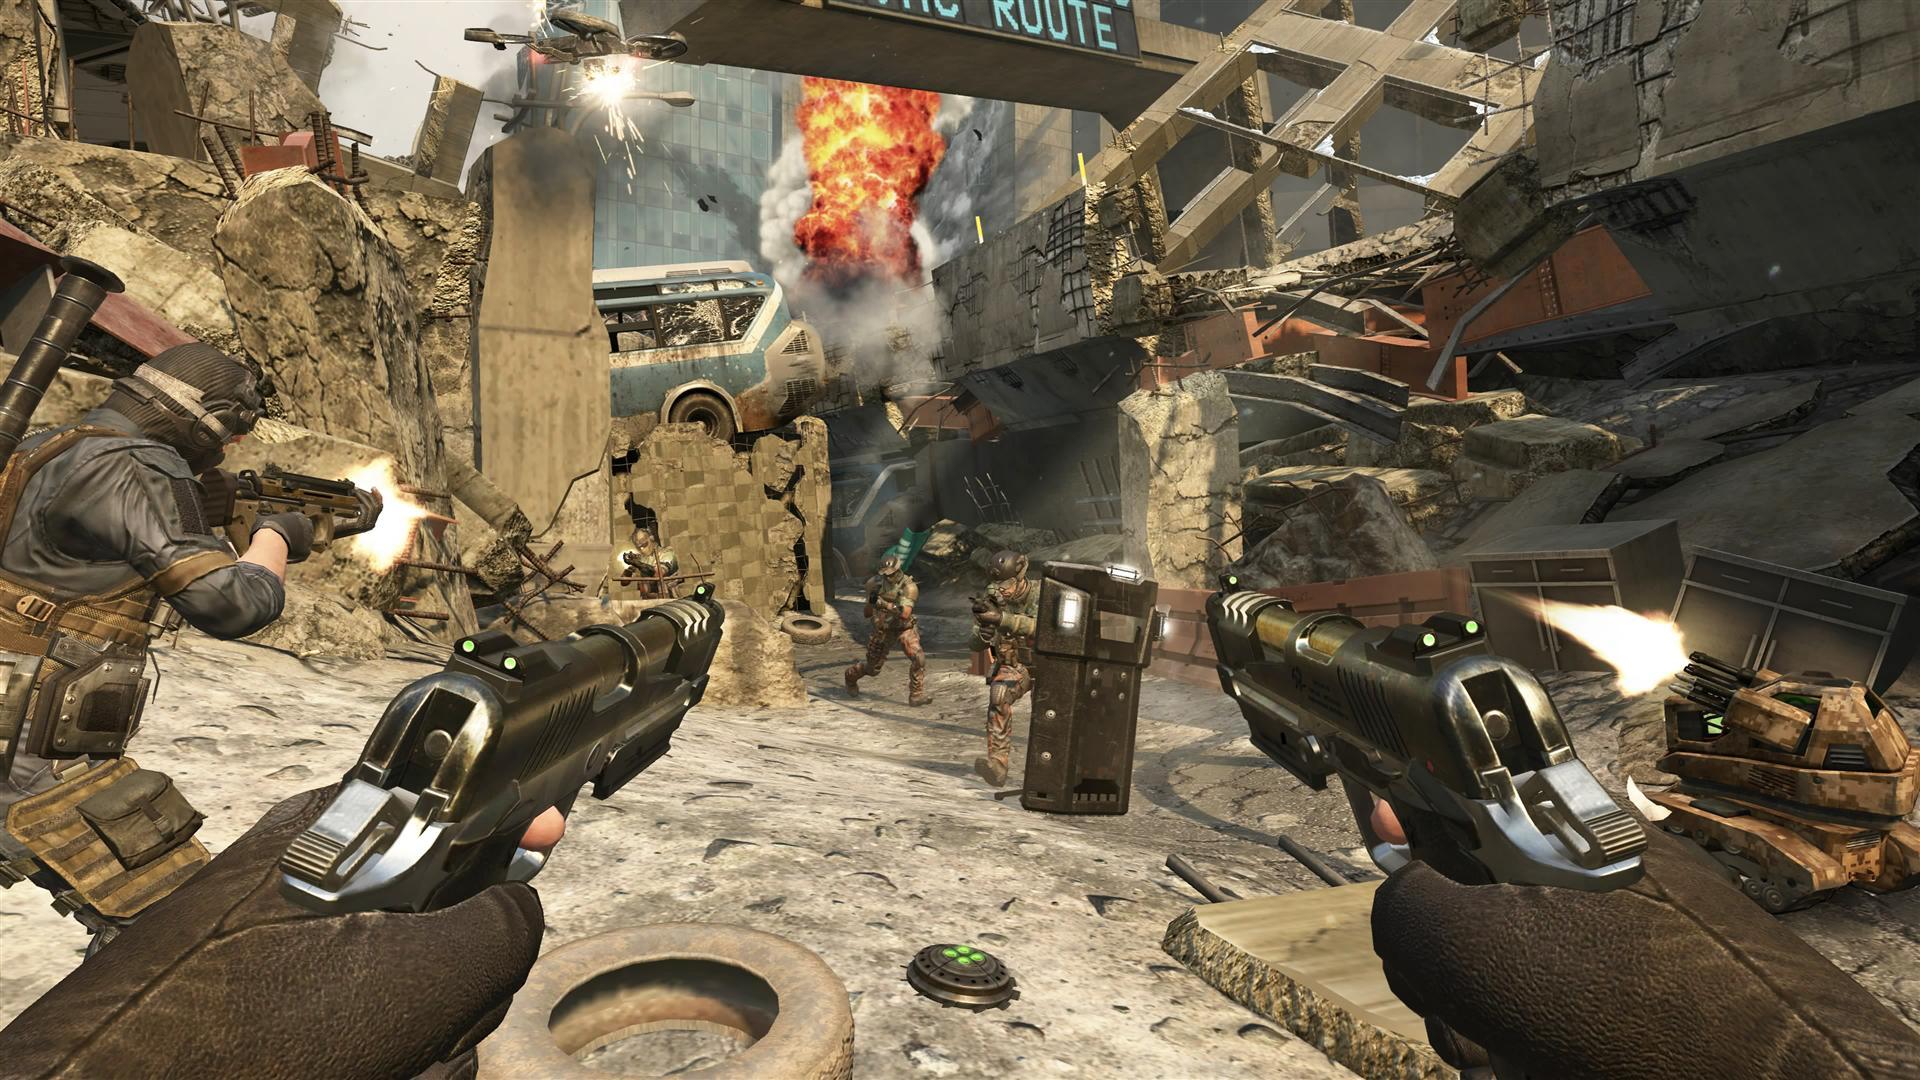 Call Of Duty Black Ops 2 Sees New Screenshots Declassified Trailer Shows Vita Gameplay Neoseeker